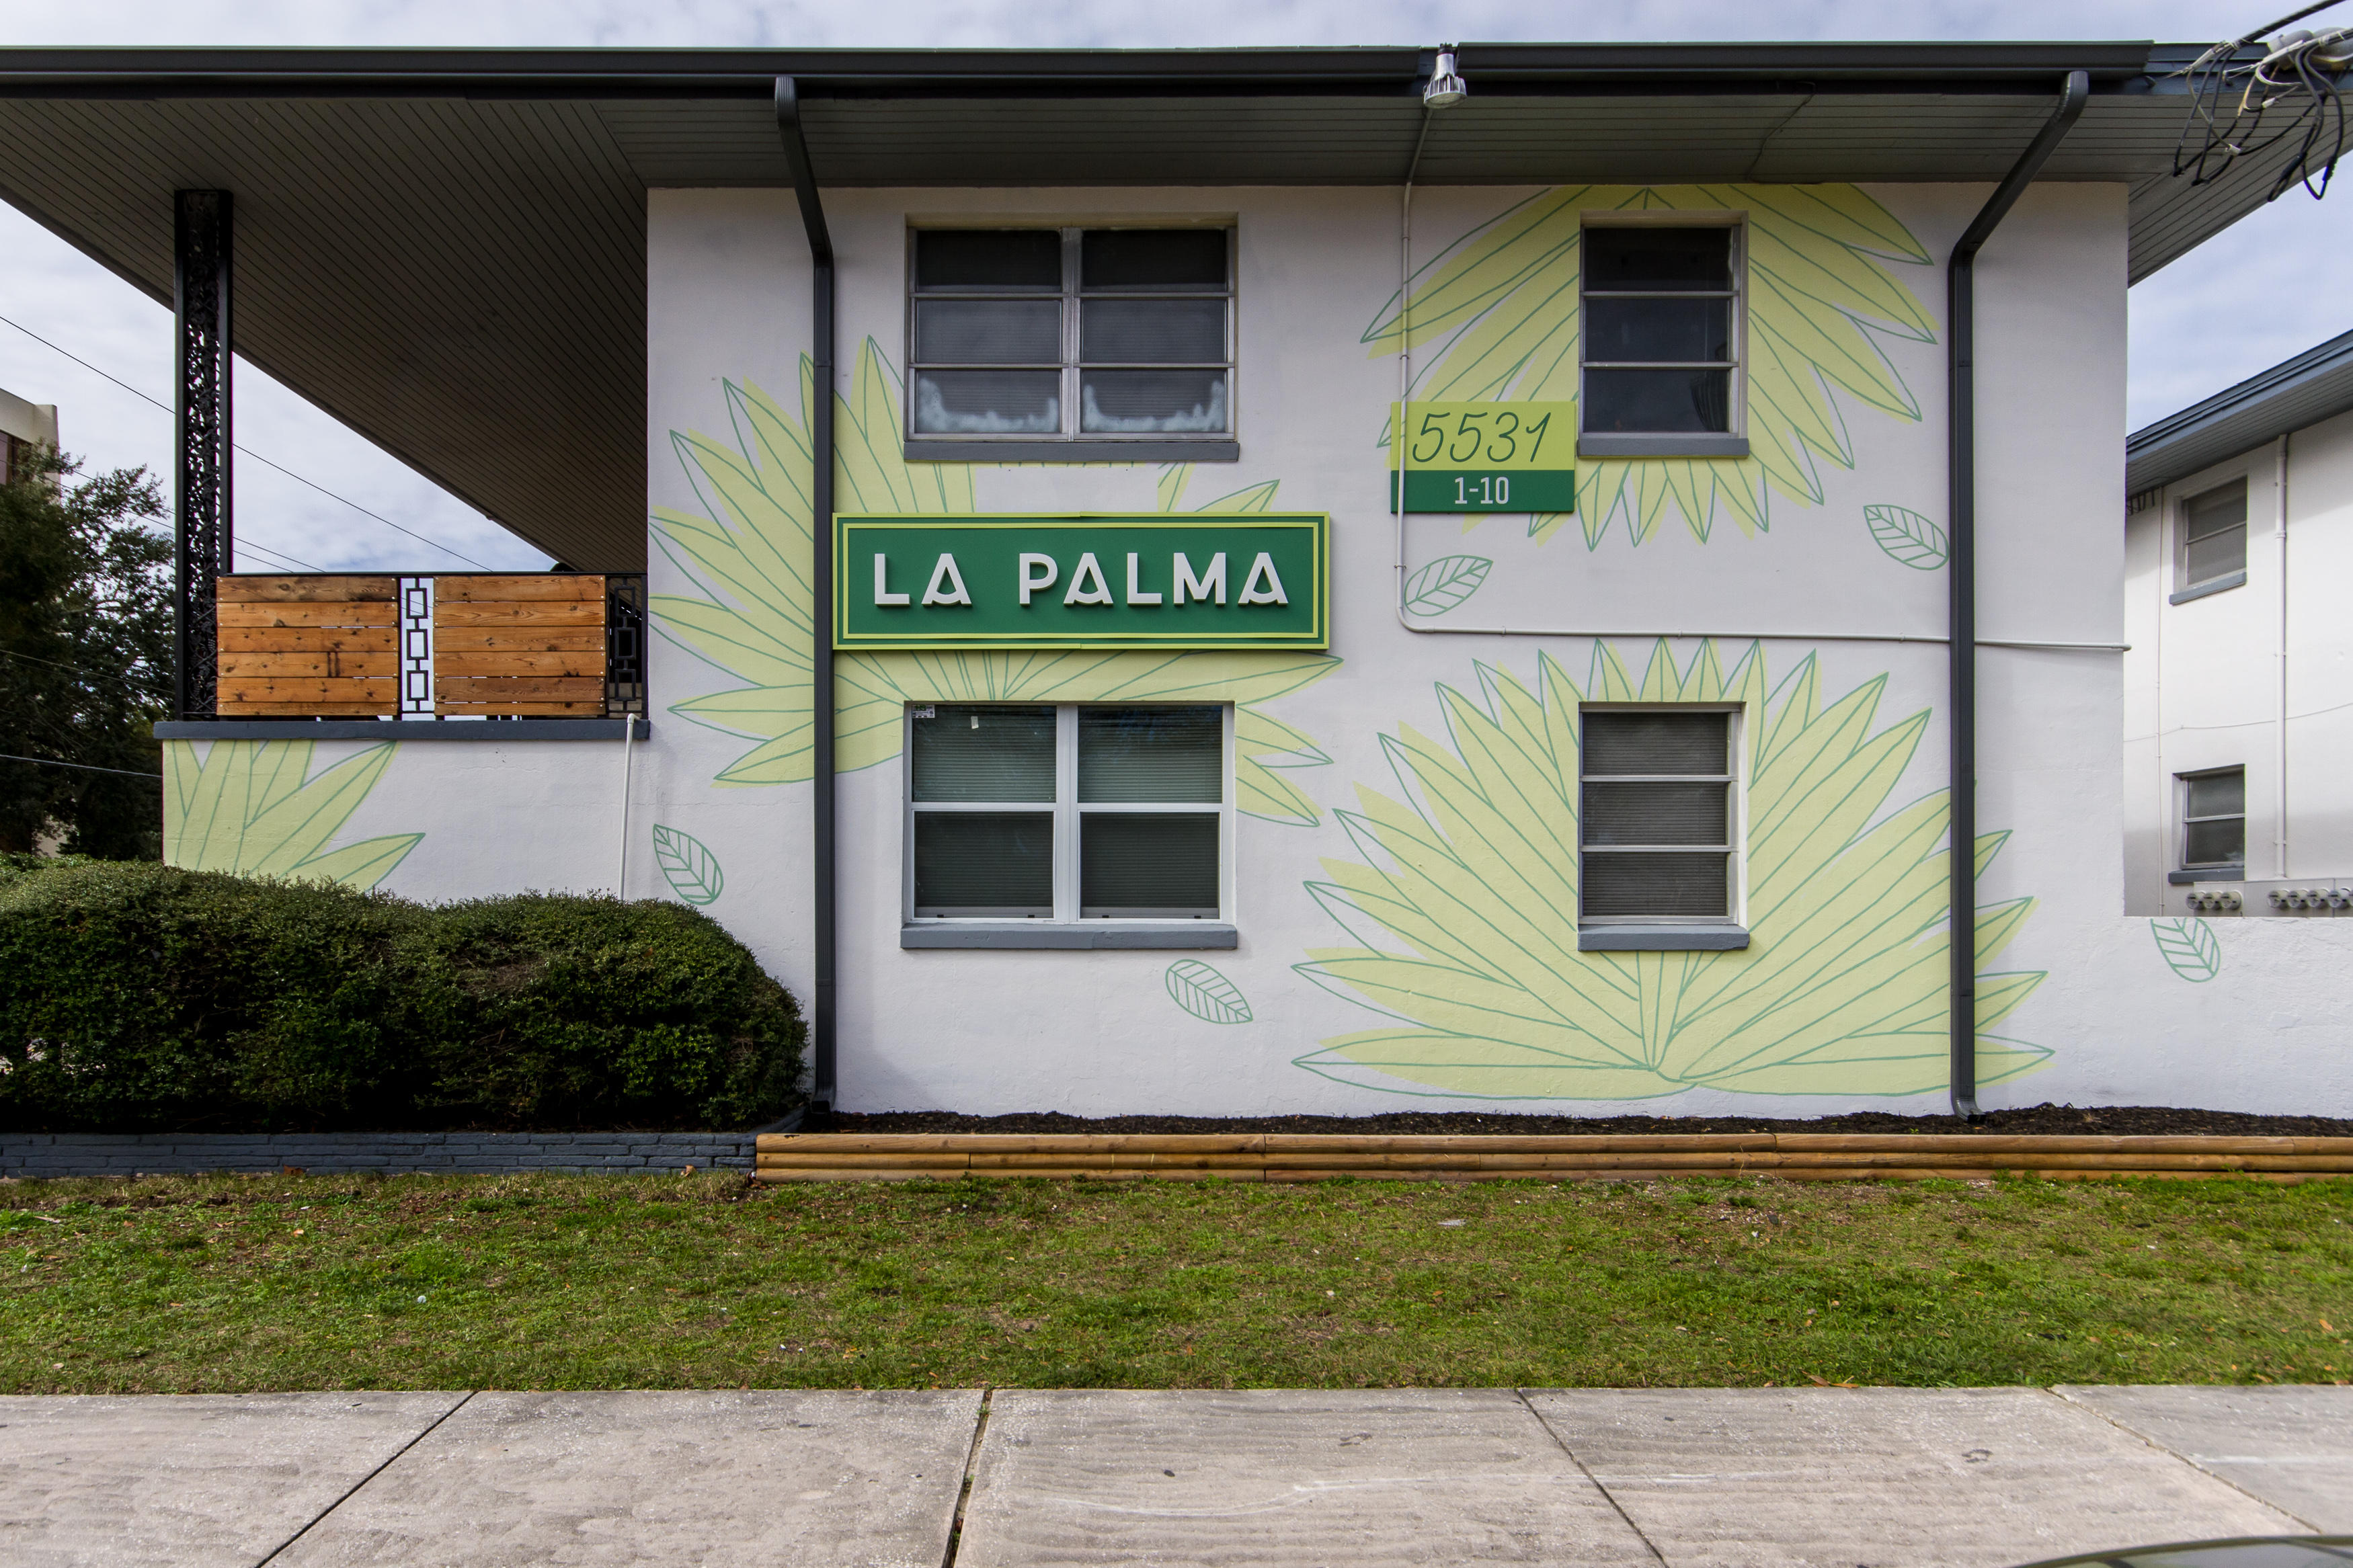 La Palma Apartments - Jacksonville, FL 32211 - (904)851-9271   ShowMeLocal.com